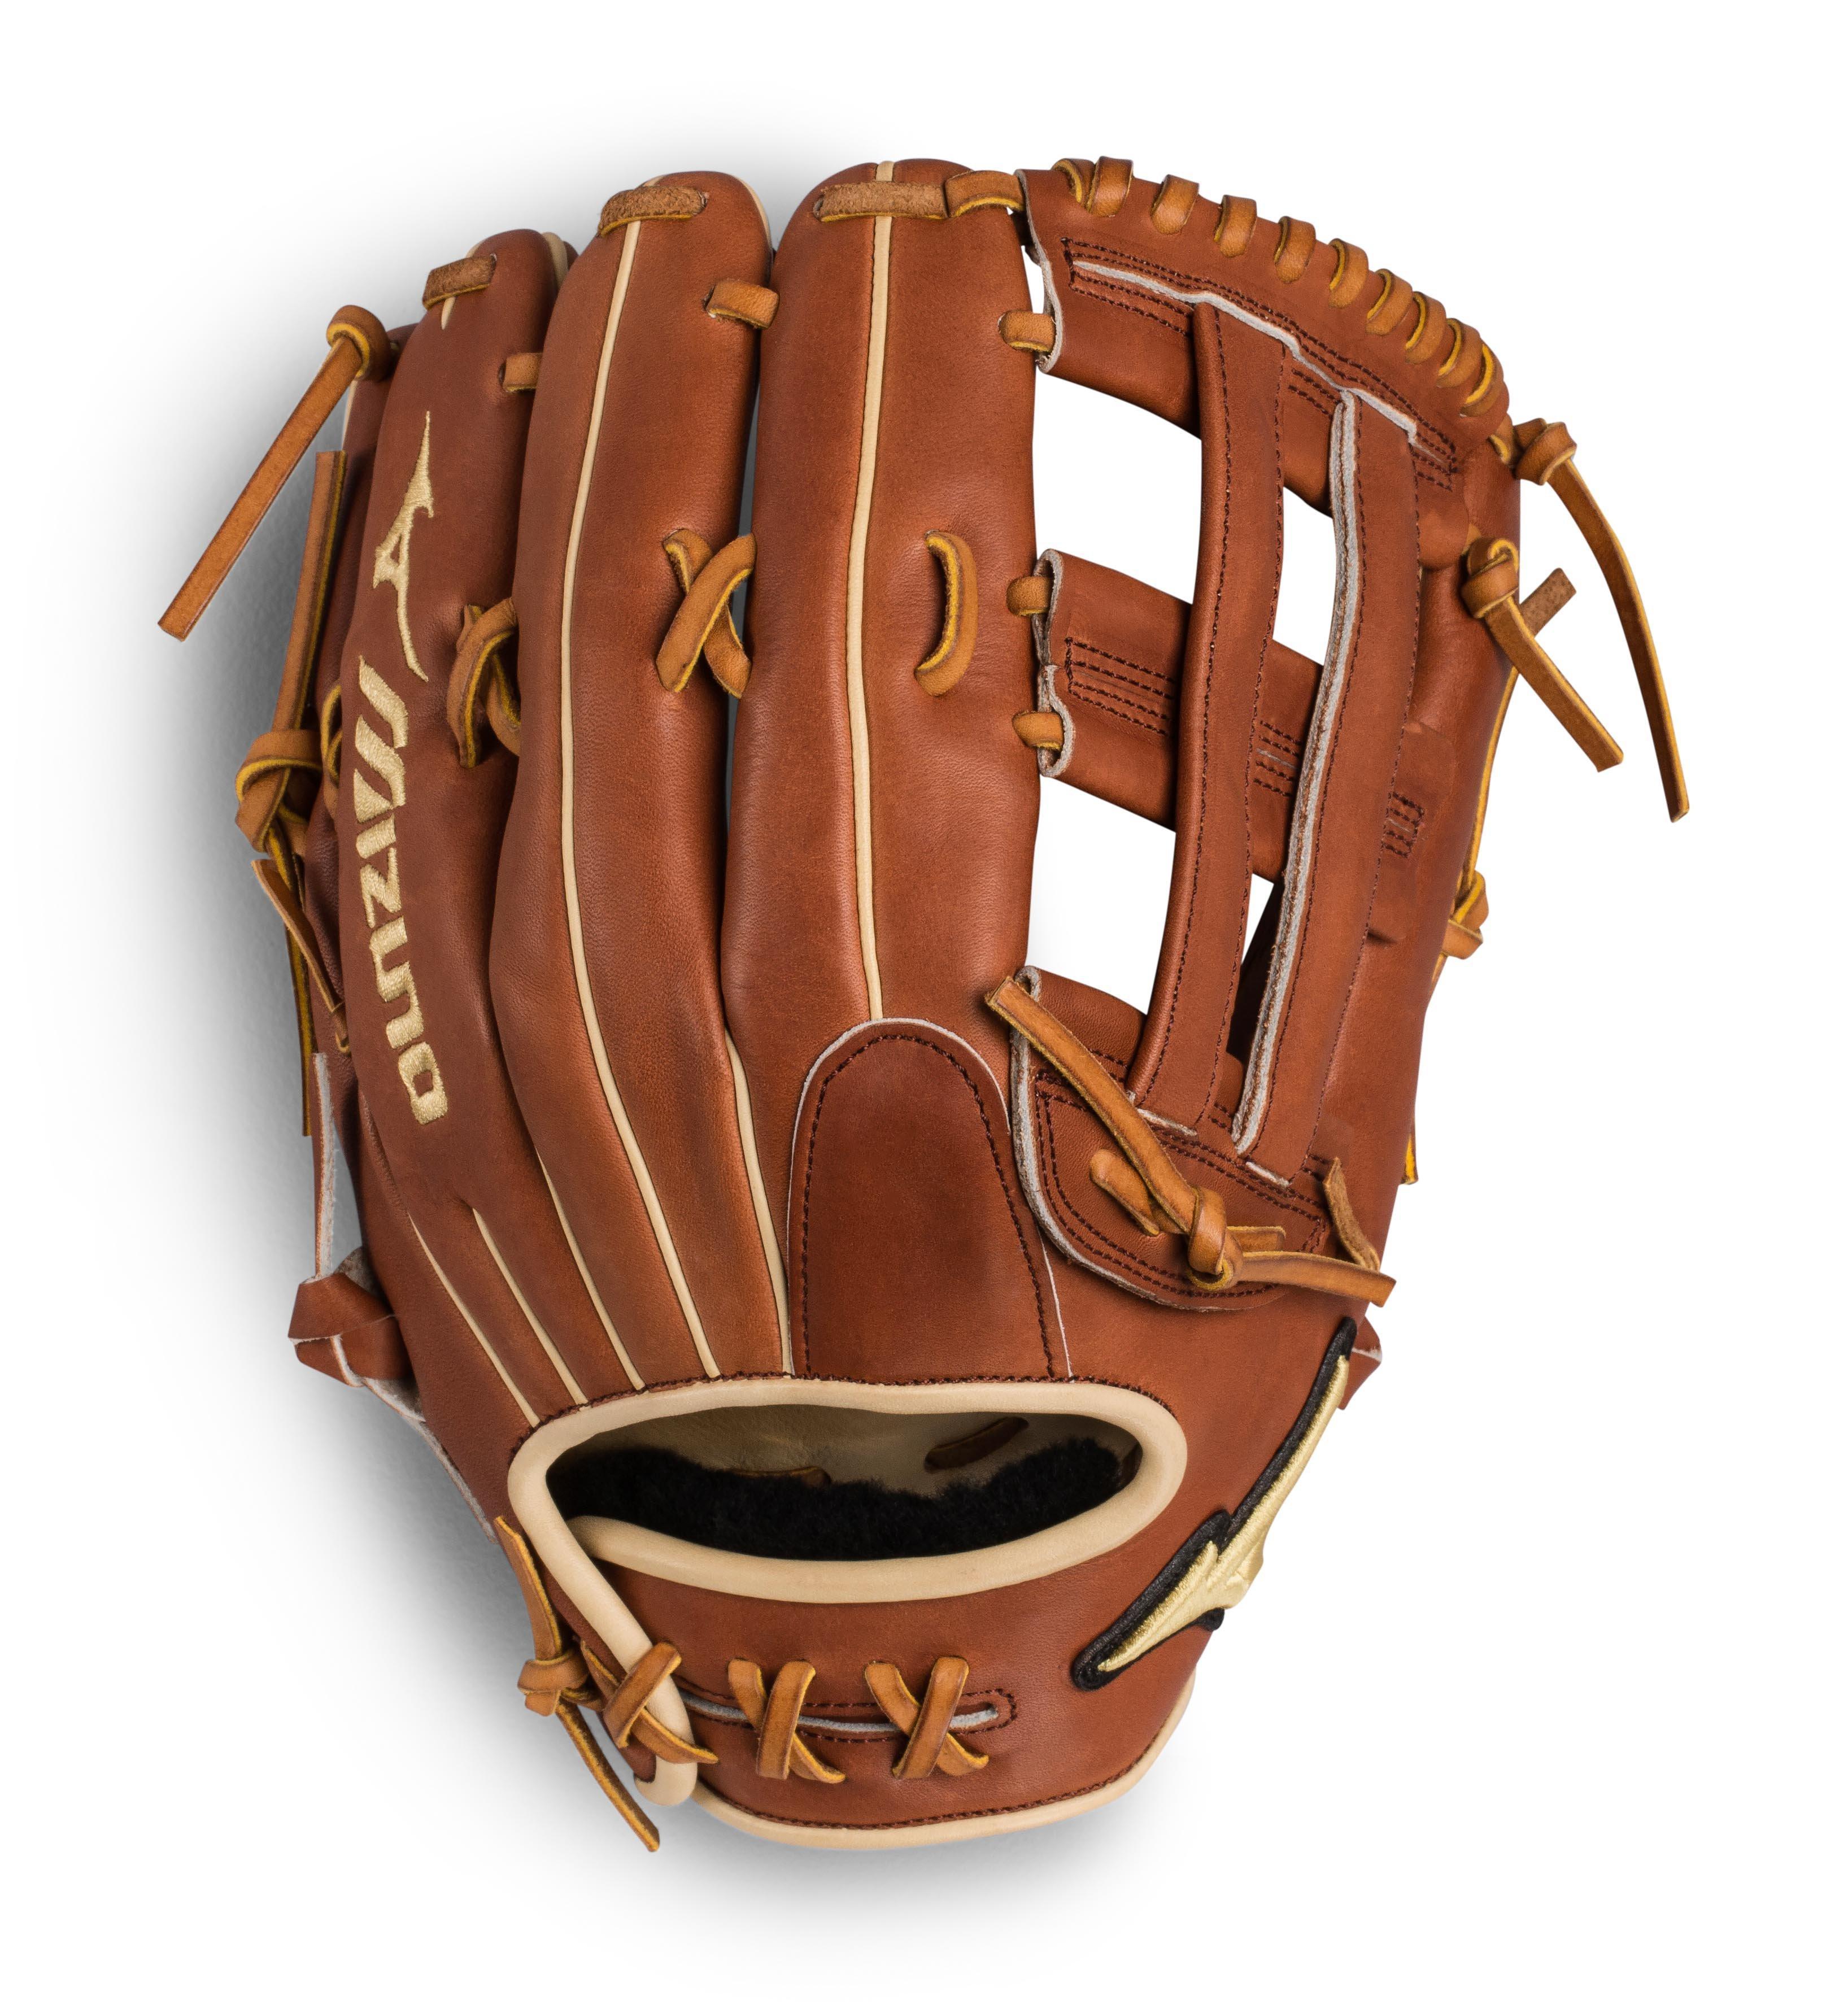 Mizuno Pro Select Baseball Glove Series